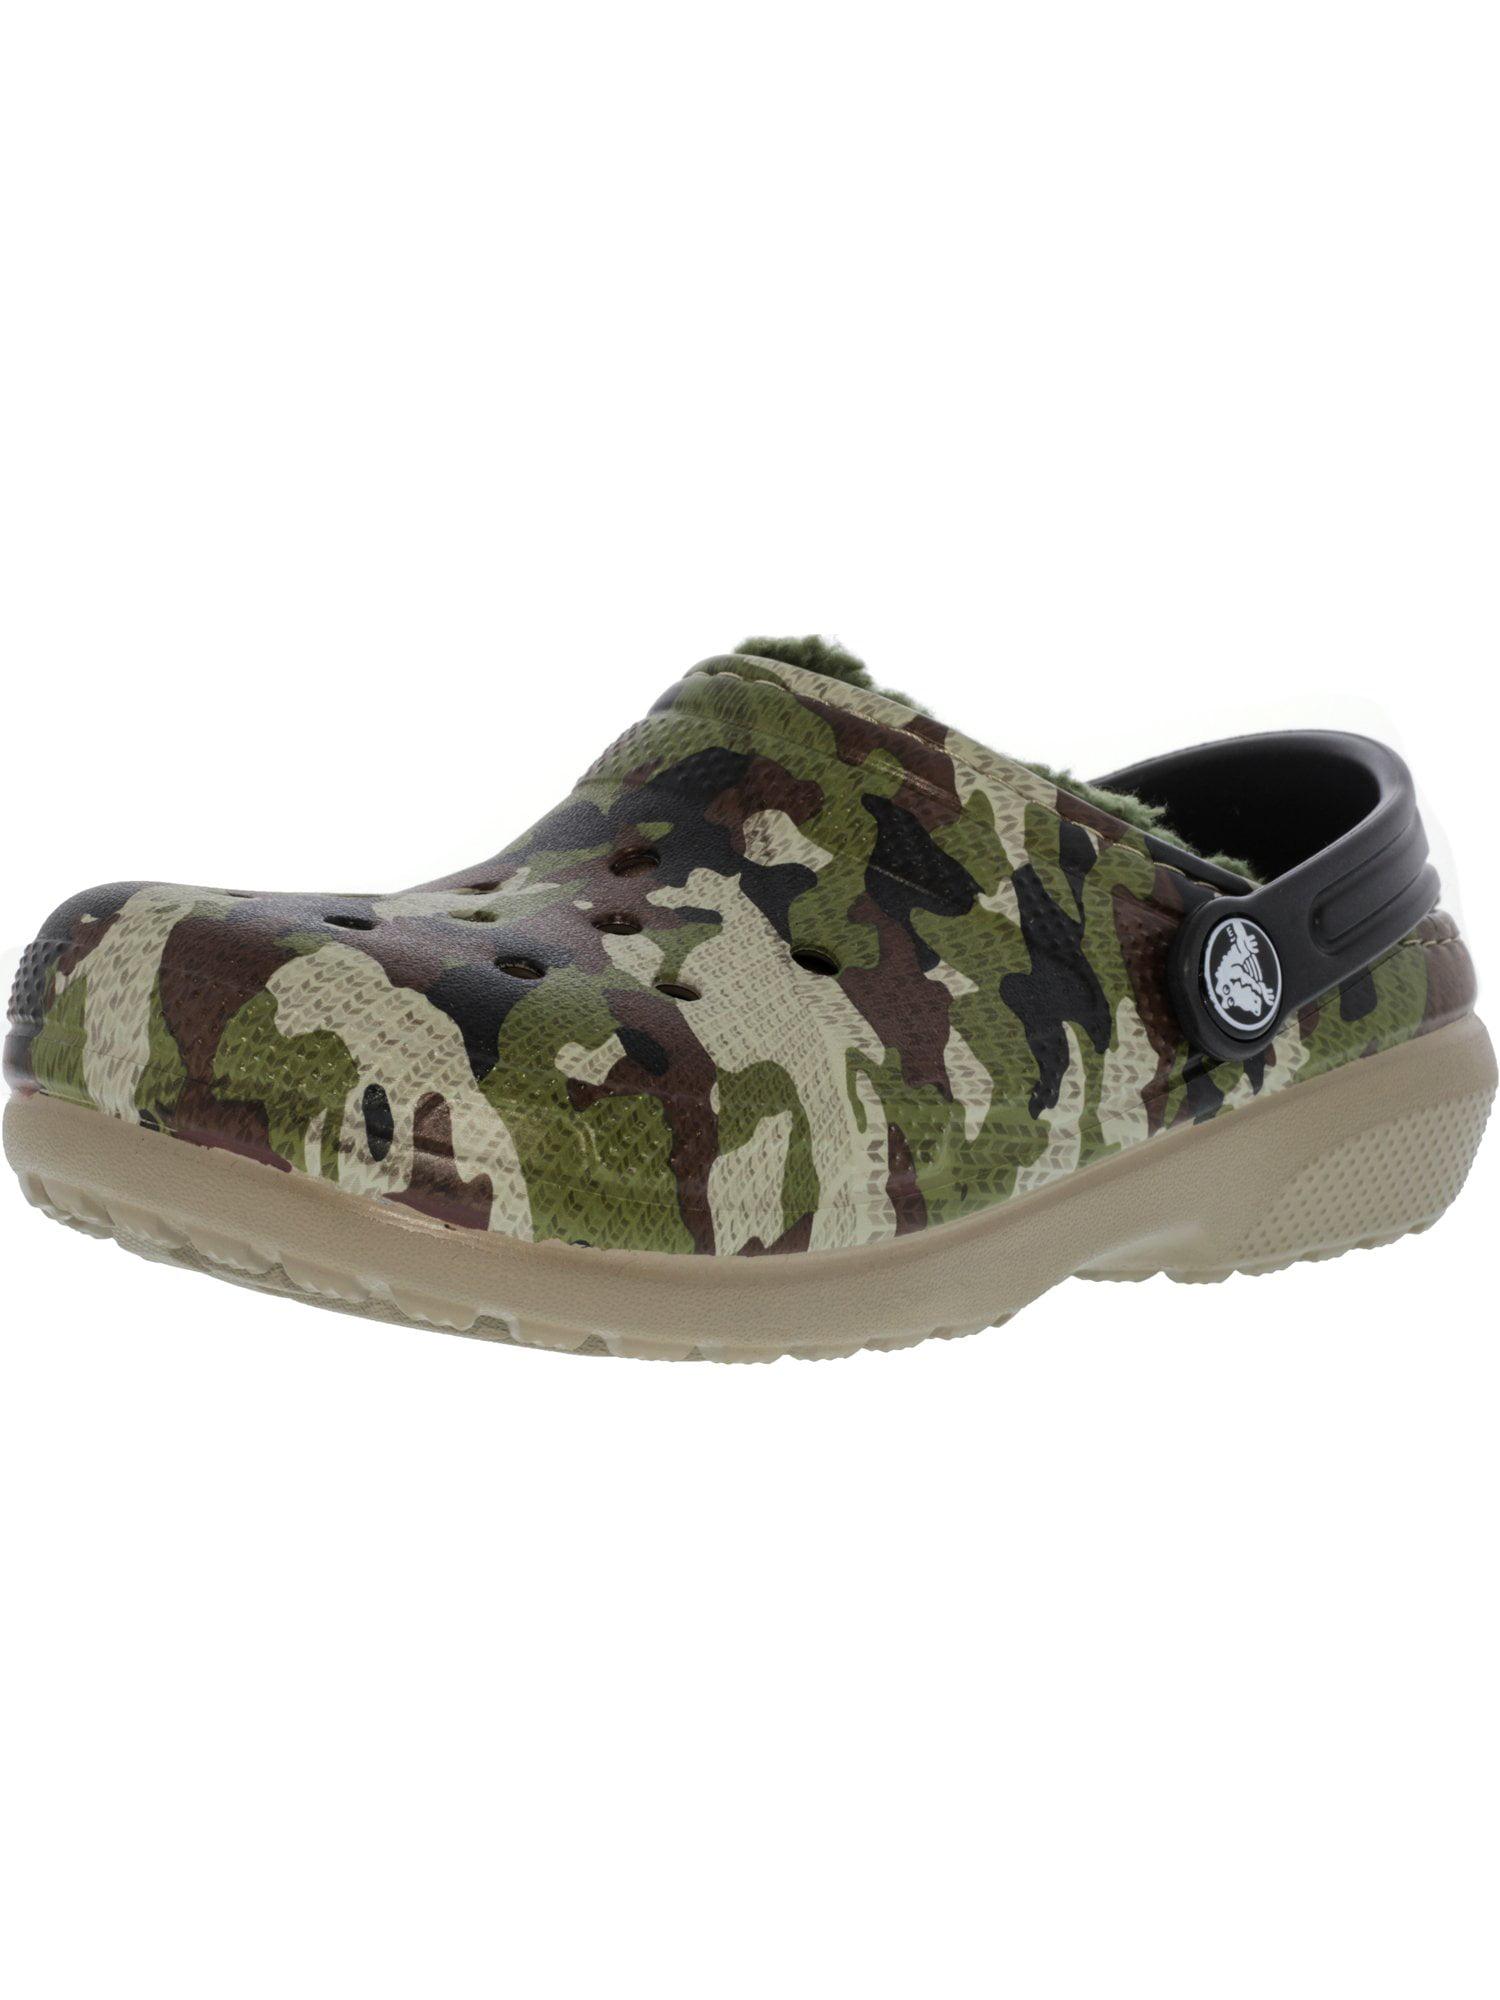 5b2347ba1 Crocs